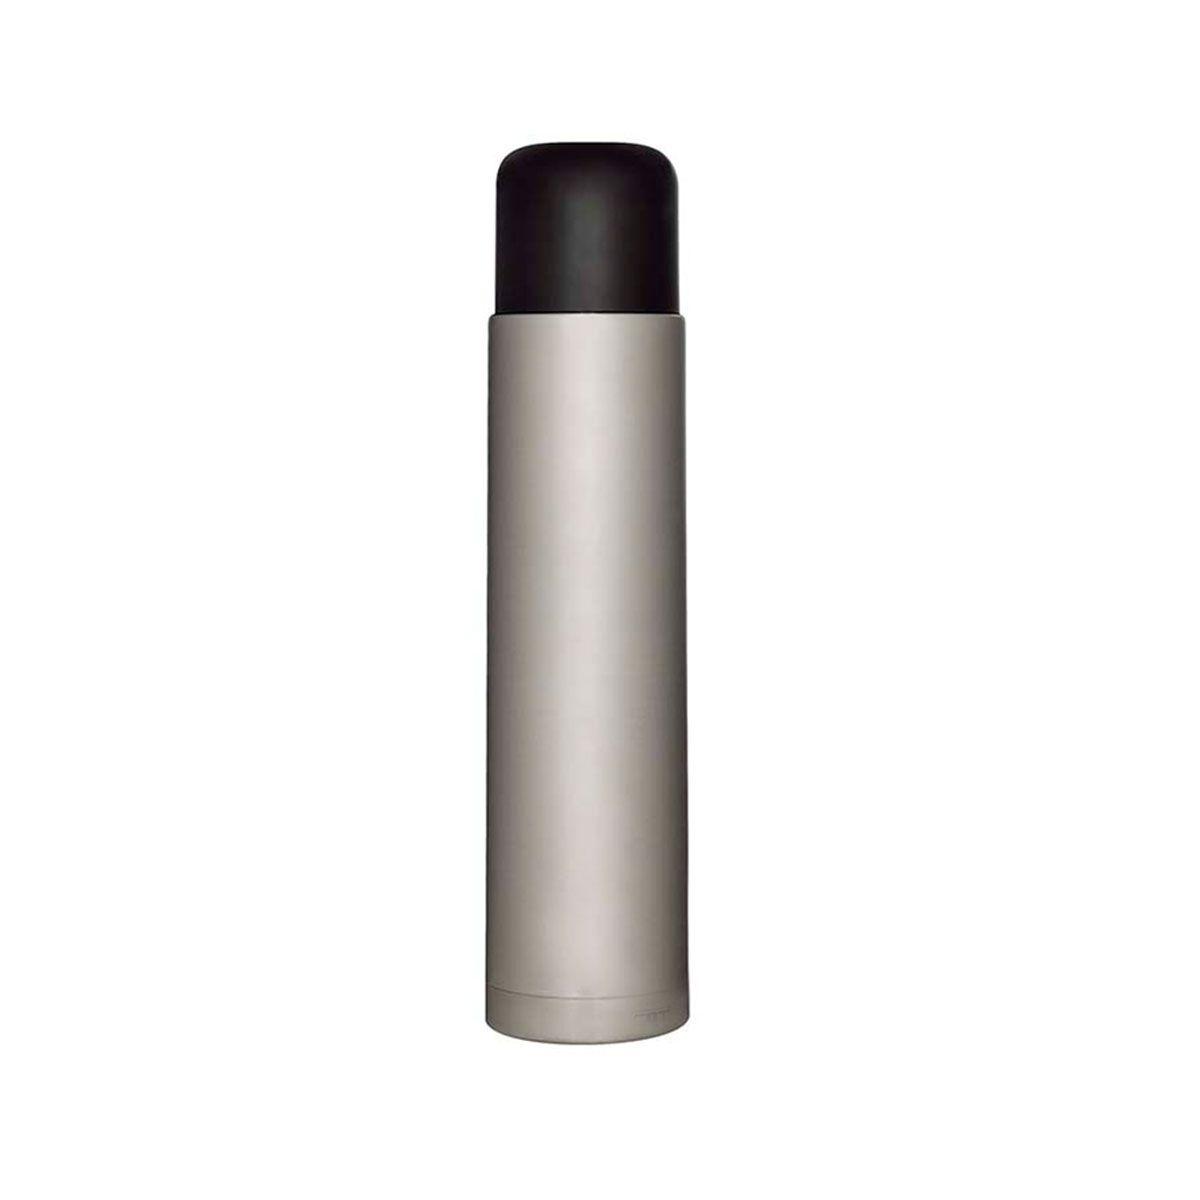 Garrafa Termica Mor Total Fit em Aço Inox - 1 Litro